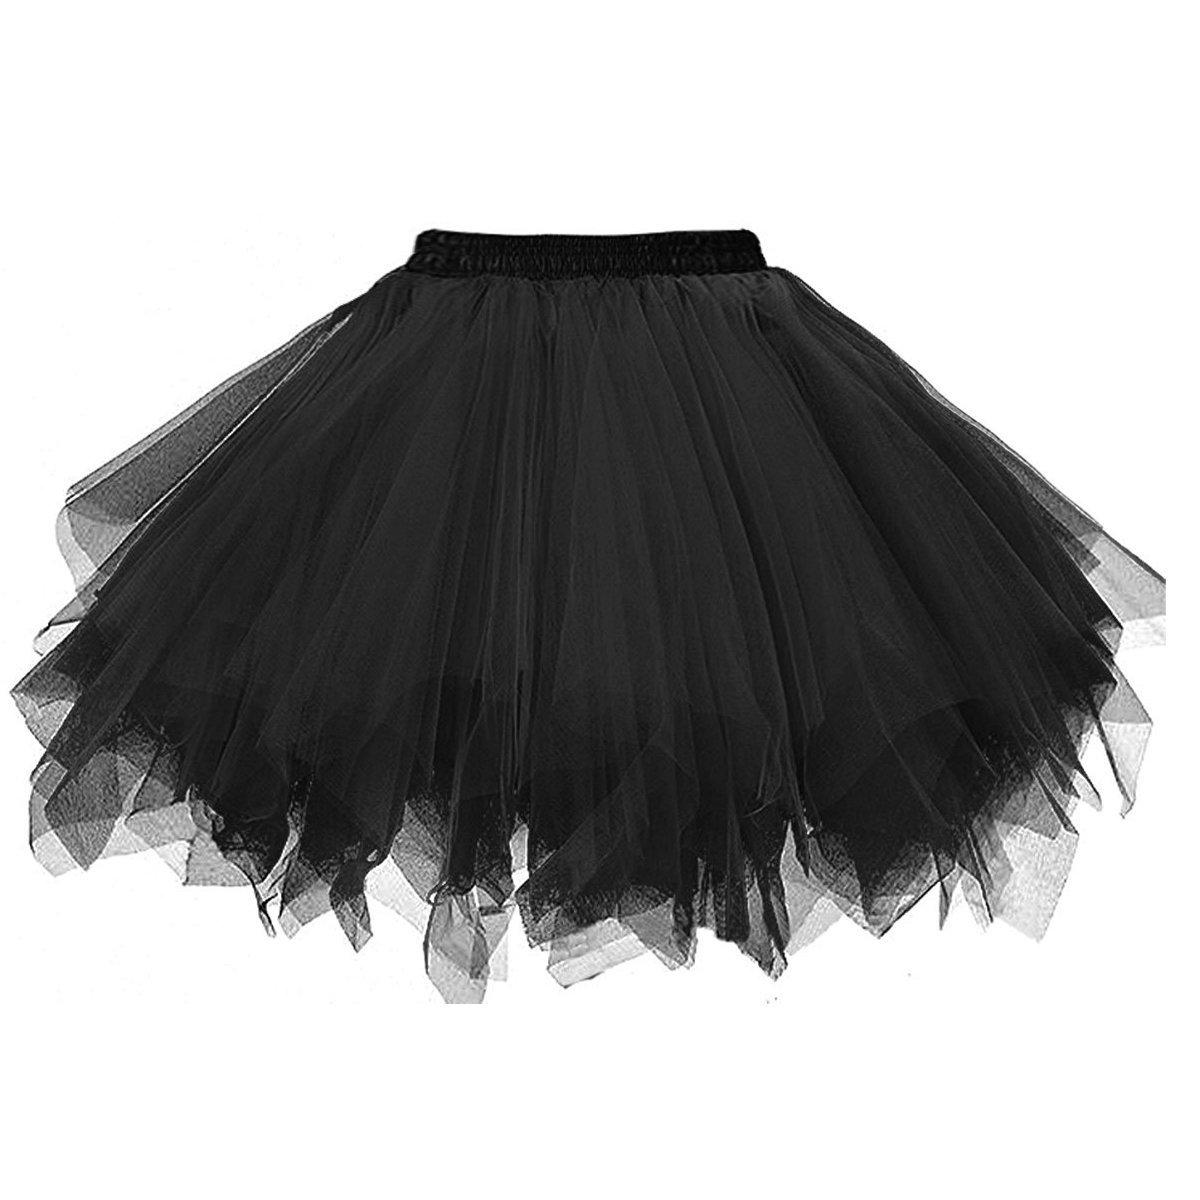 Big Girls Tutu Skirts Layered Tulle Princess Dresses Sparkle Halloween Tutu Black by BIFINI (Image #1)